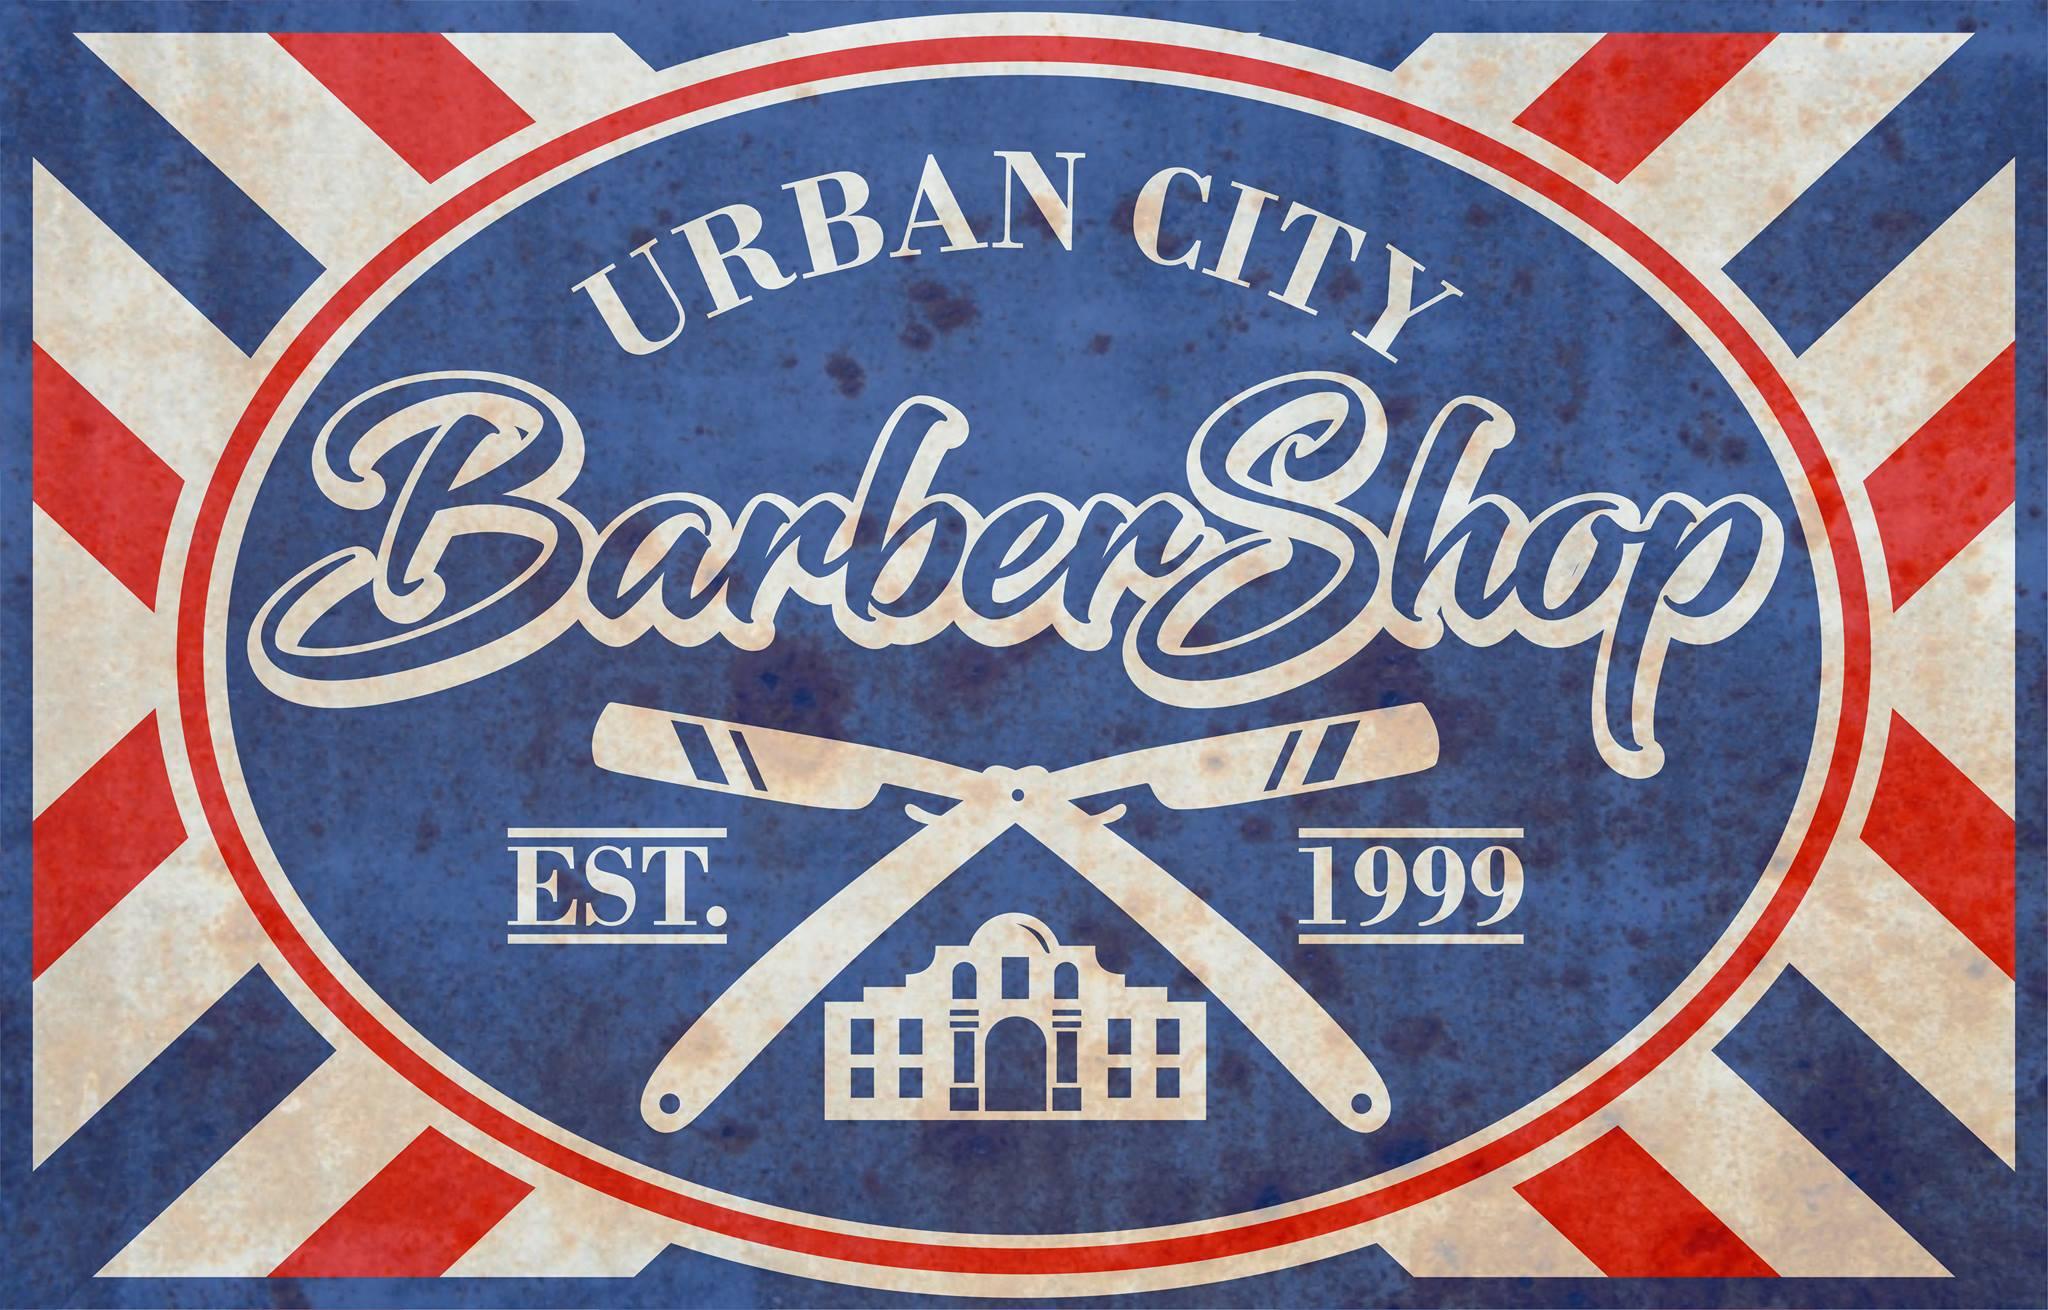 urban city barbershop  franchise